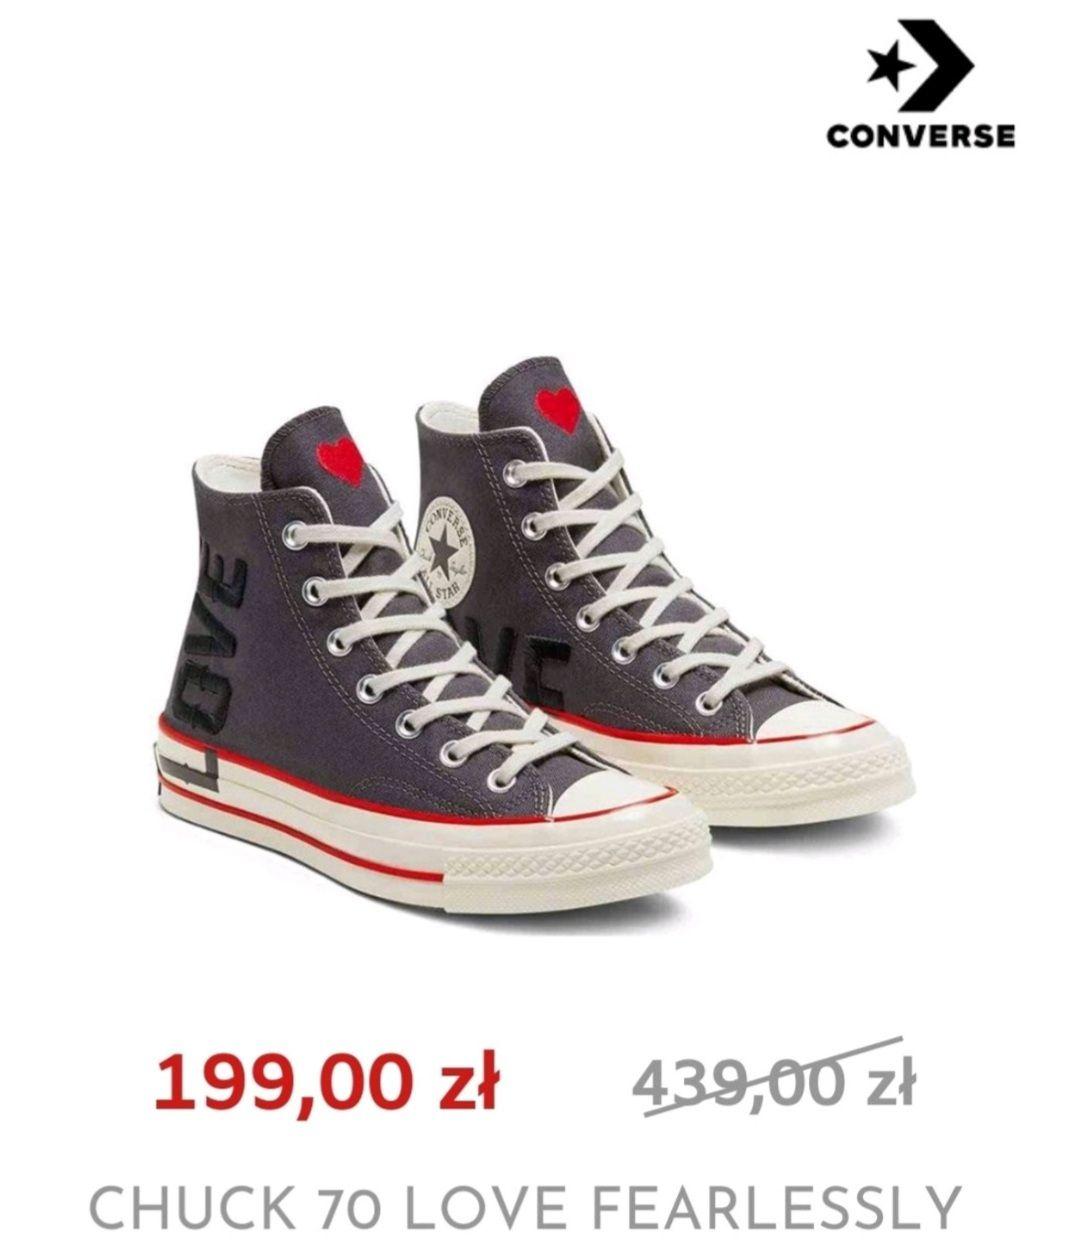 Trampki Converse Chuck 70 x Love Fearlessly 567153C